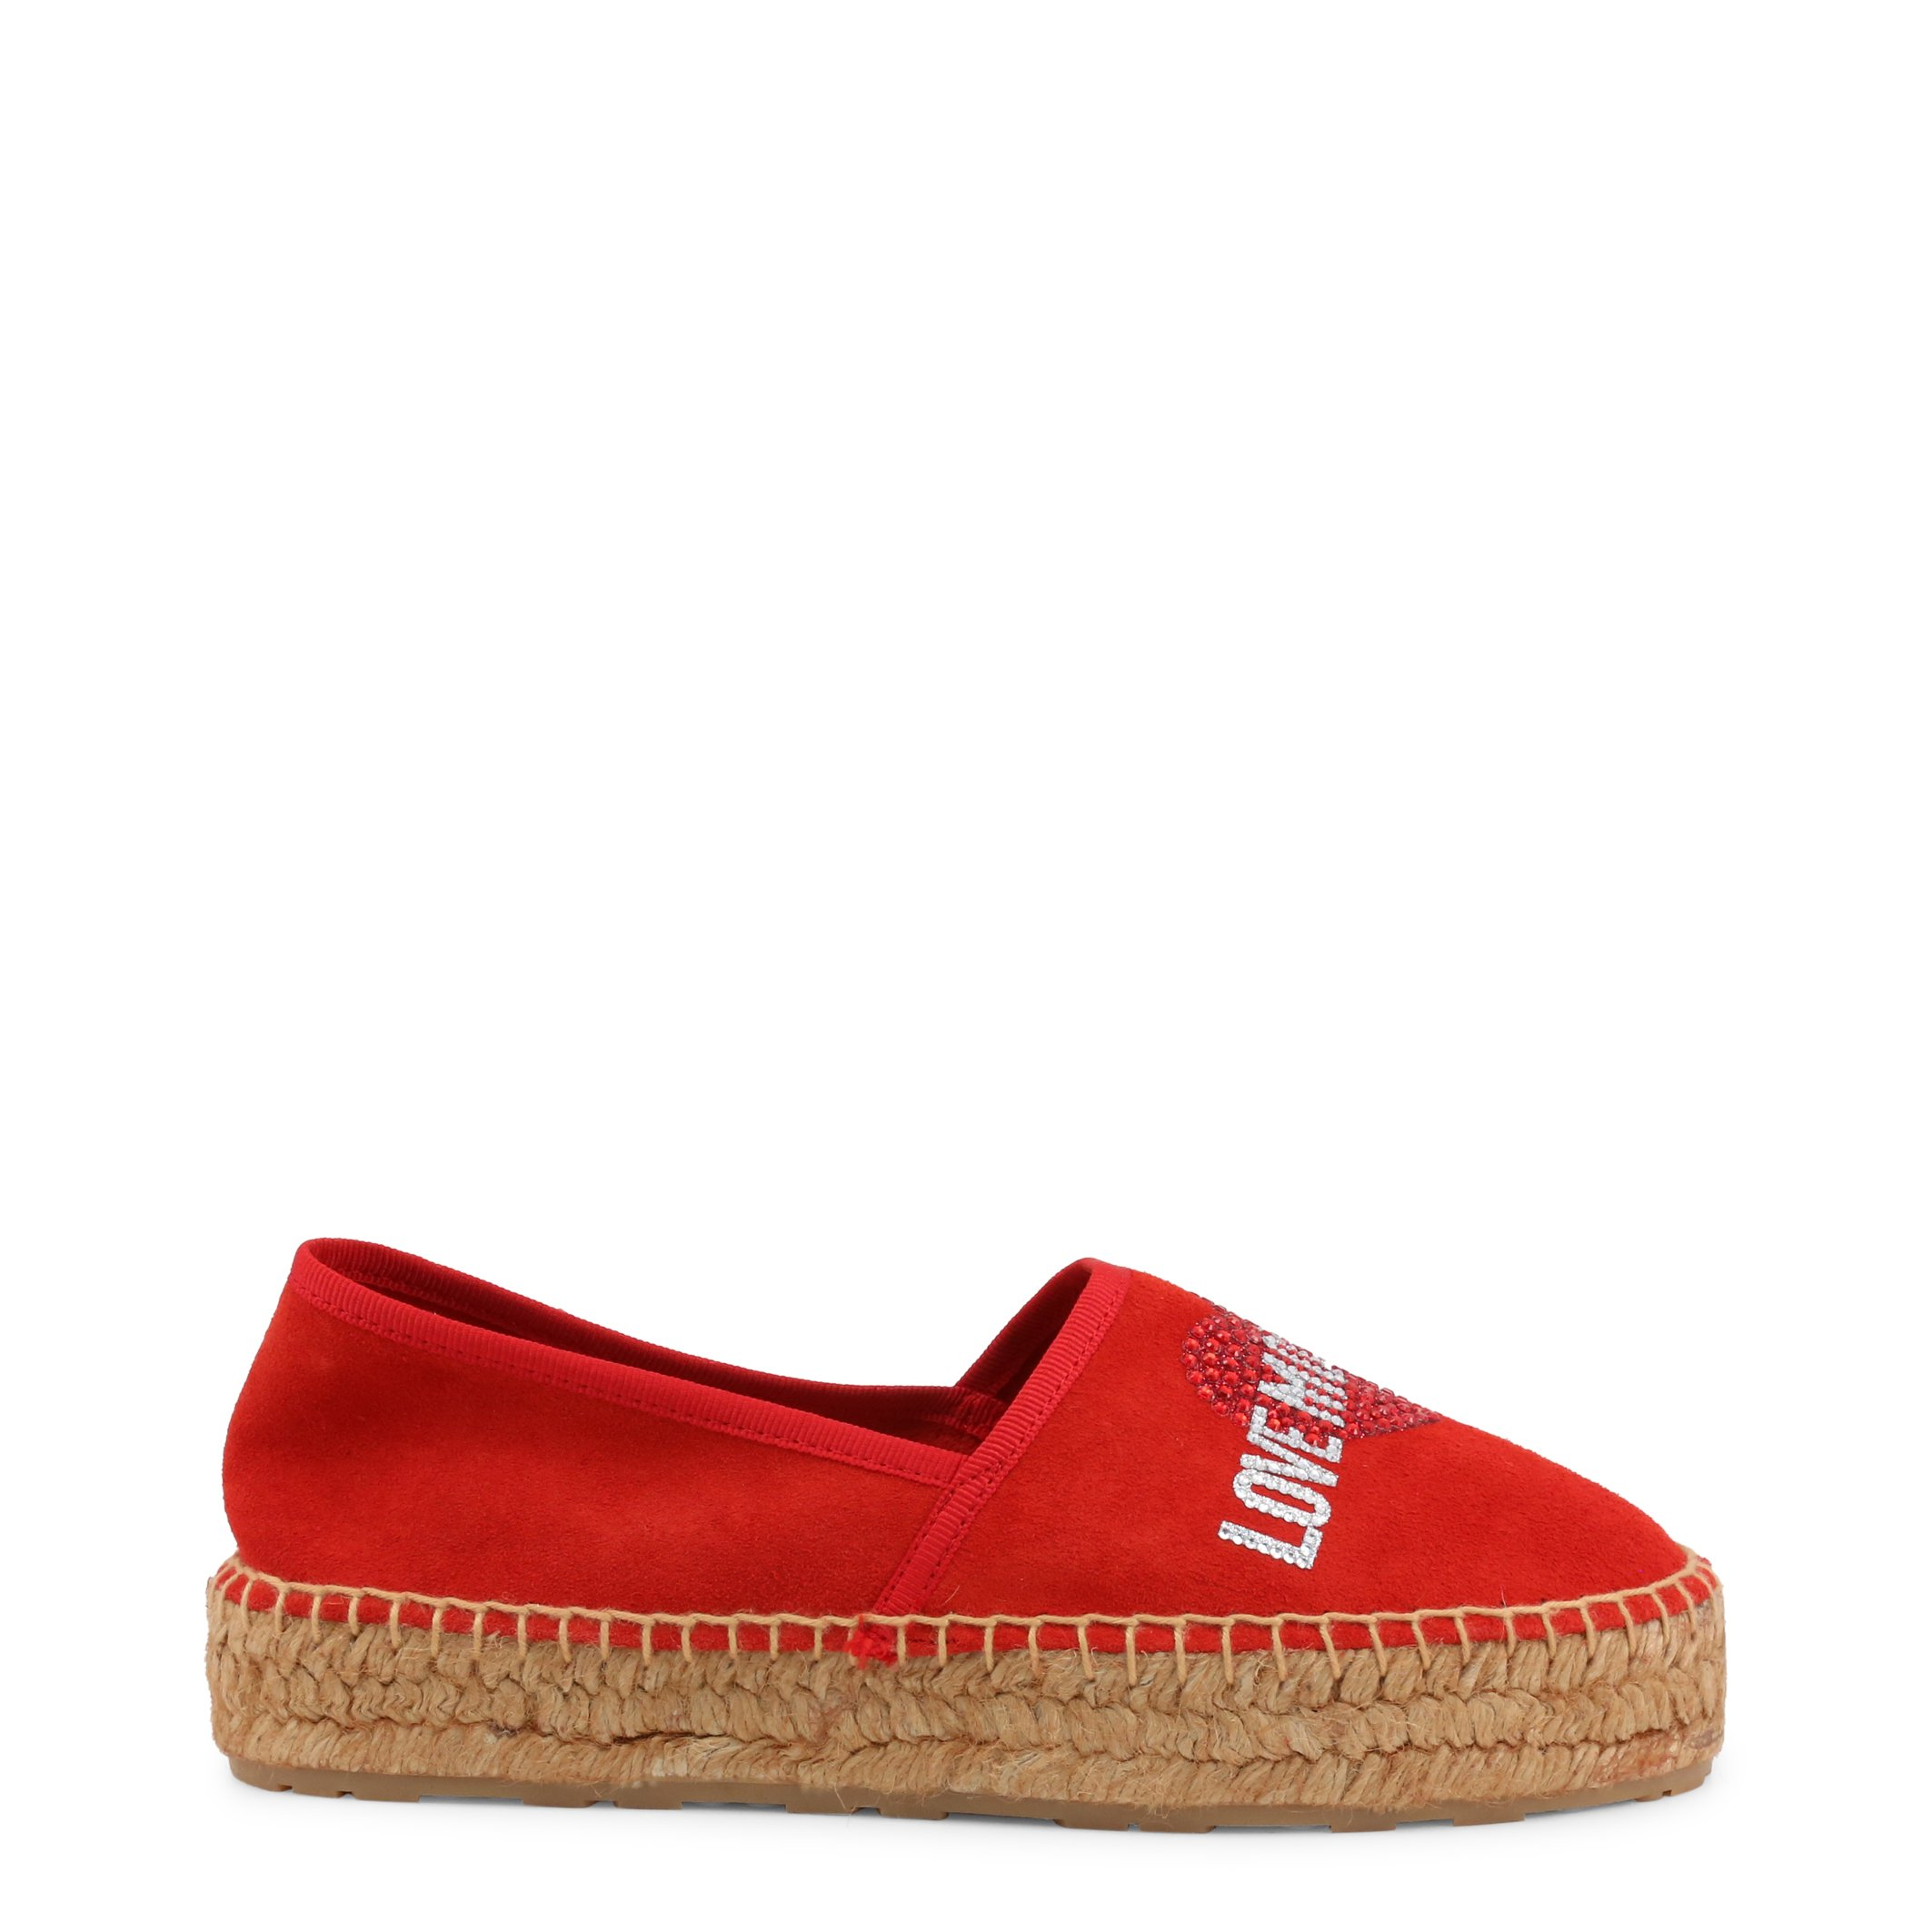 Love Moschino Women's Slip On Shoes Grey JA10023G1CIF0 - red EU 35